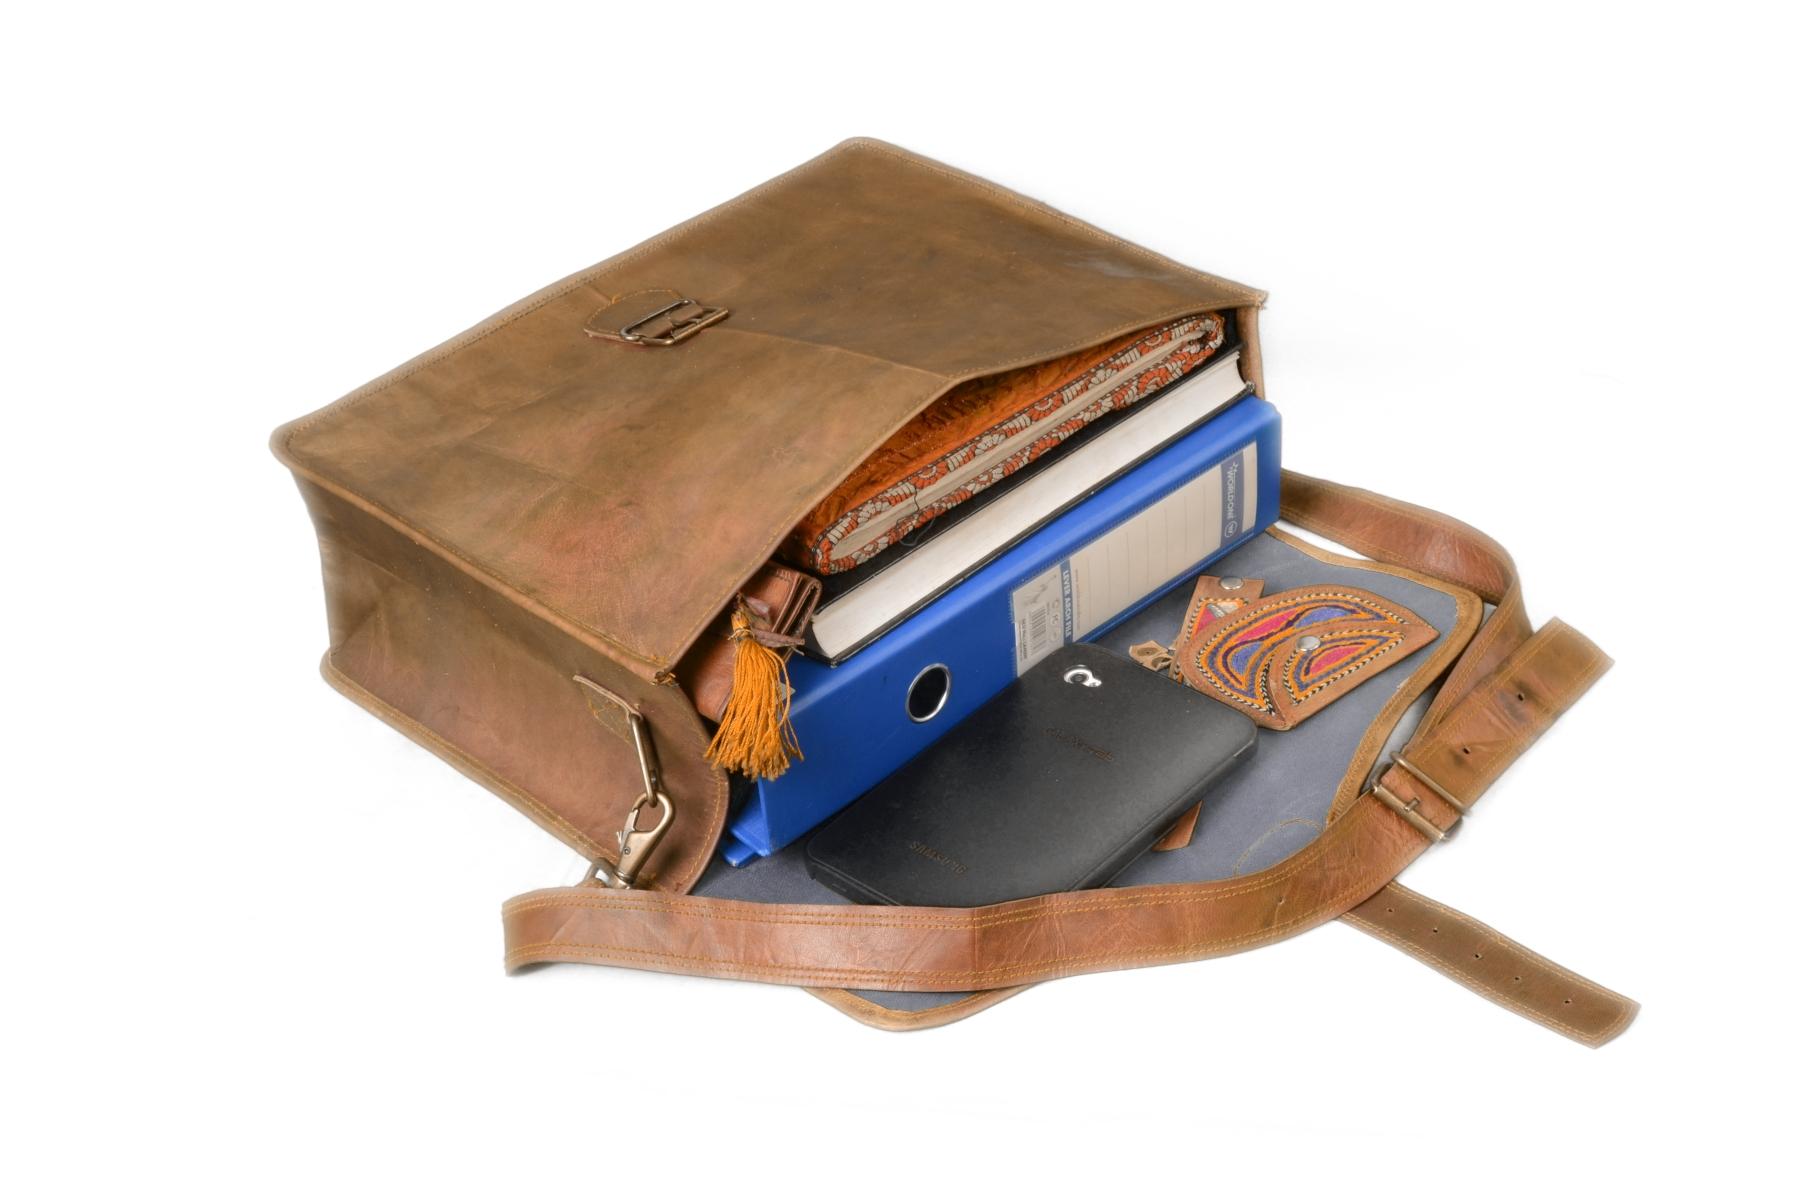 a08fb8147f2 10″ leather messenger bag, Ethical Fashion Laptop Satchel Mac book  Messenger Bag